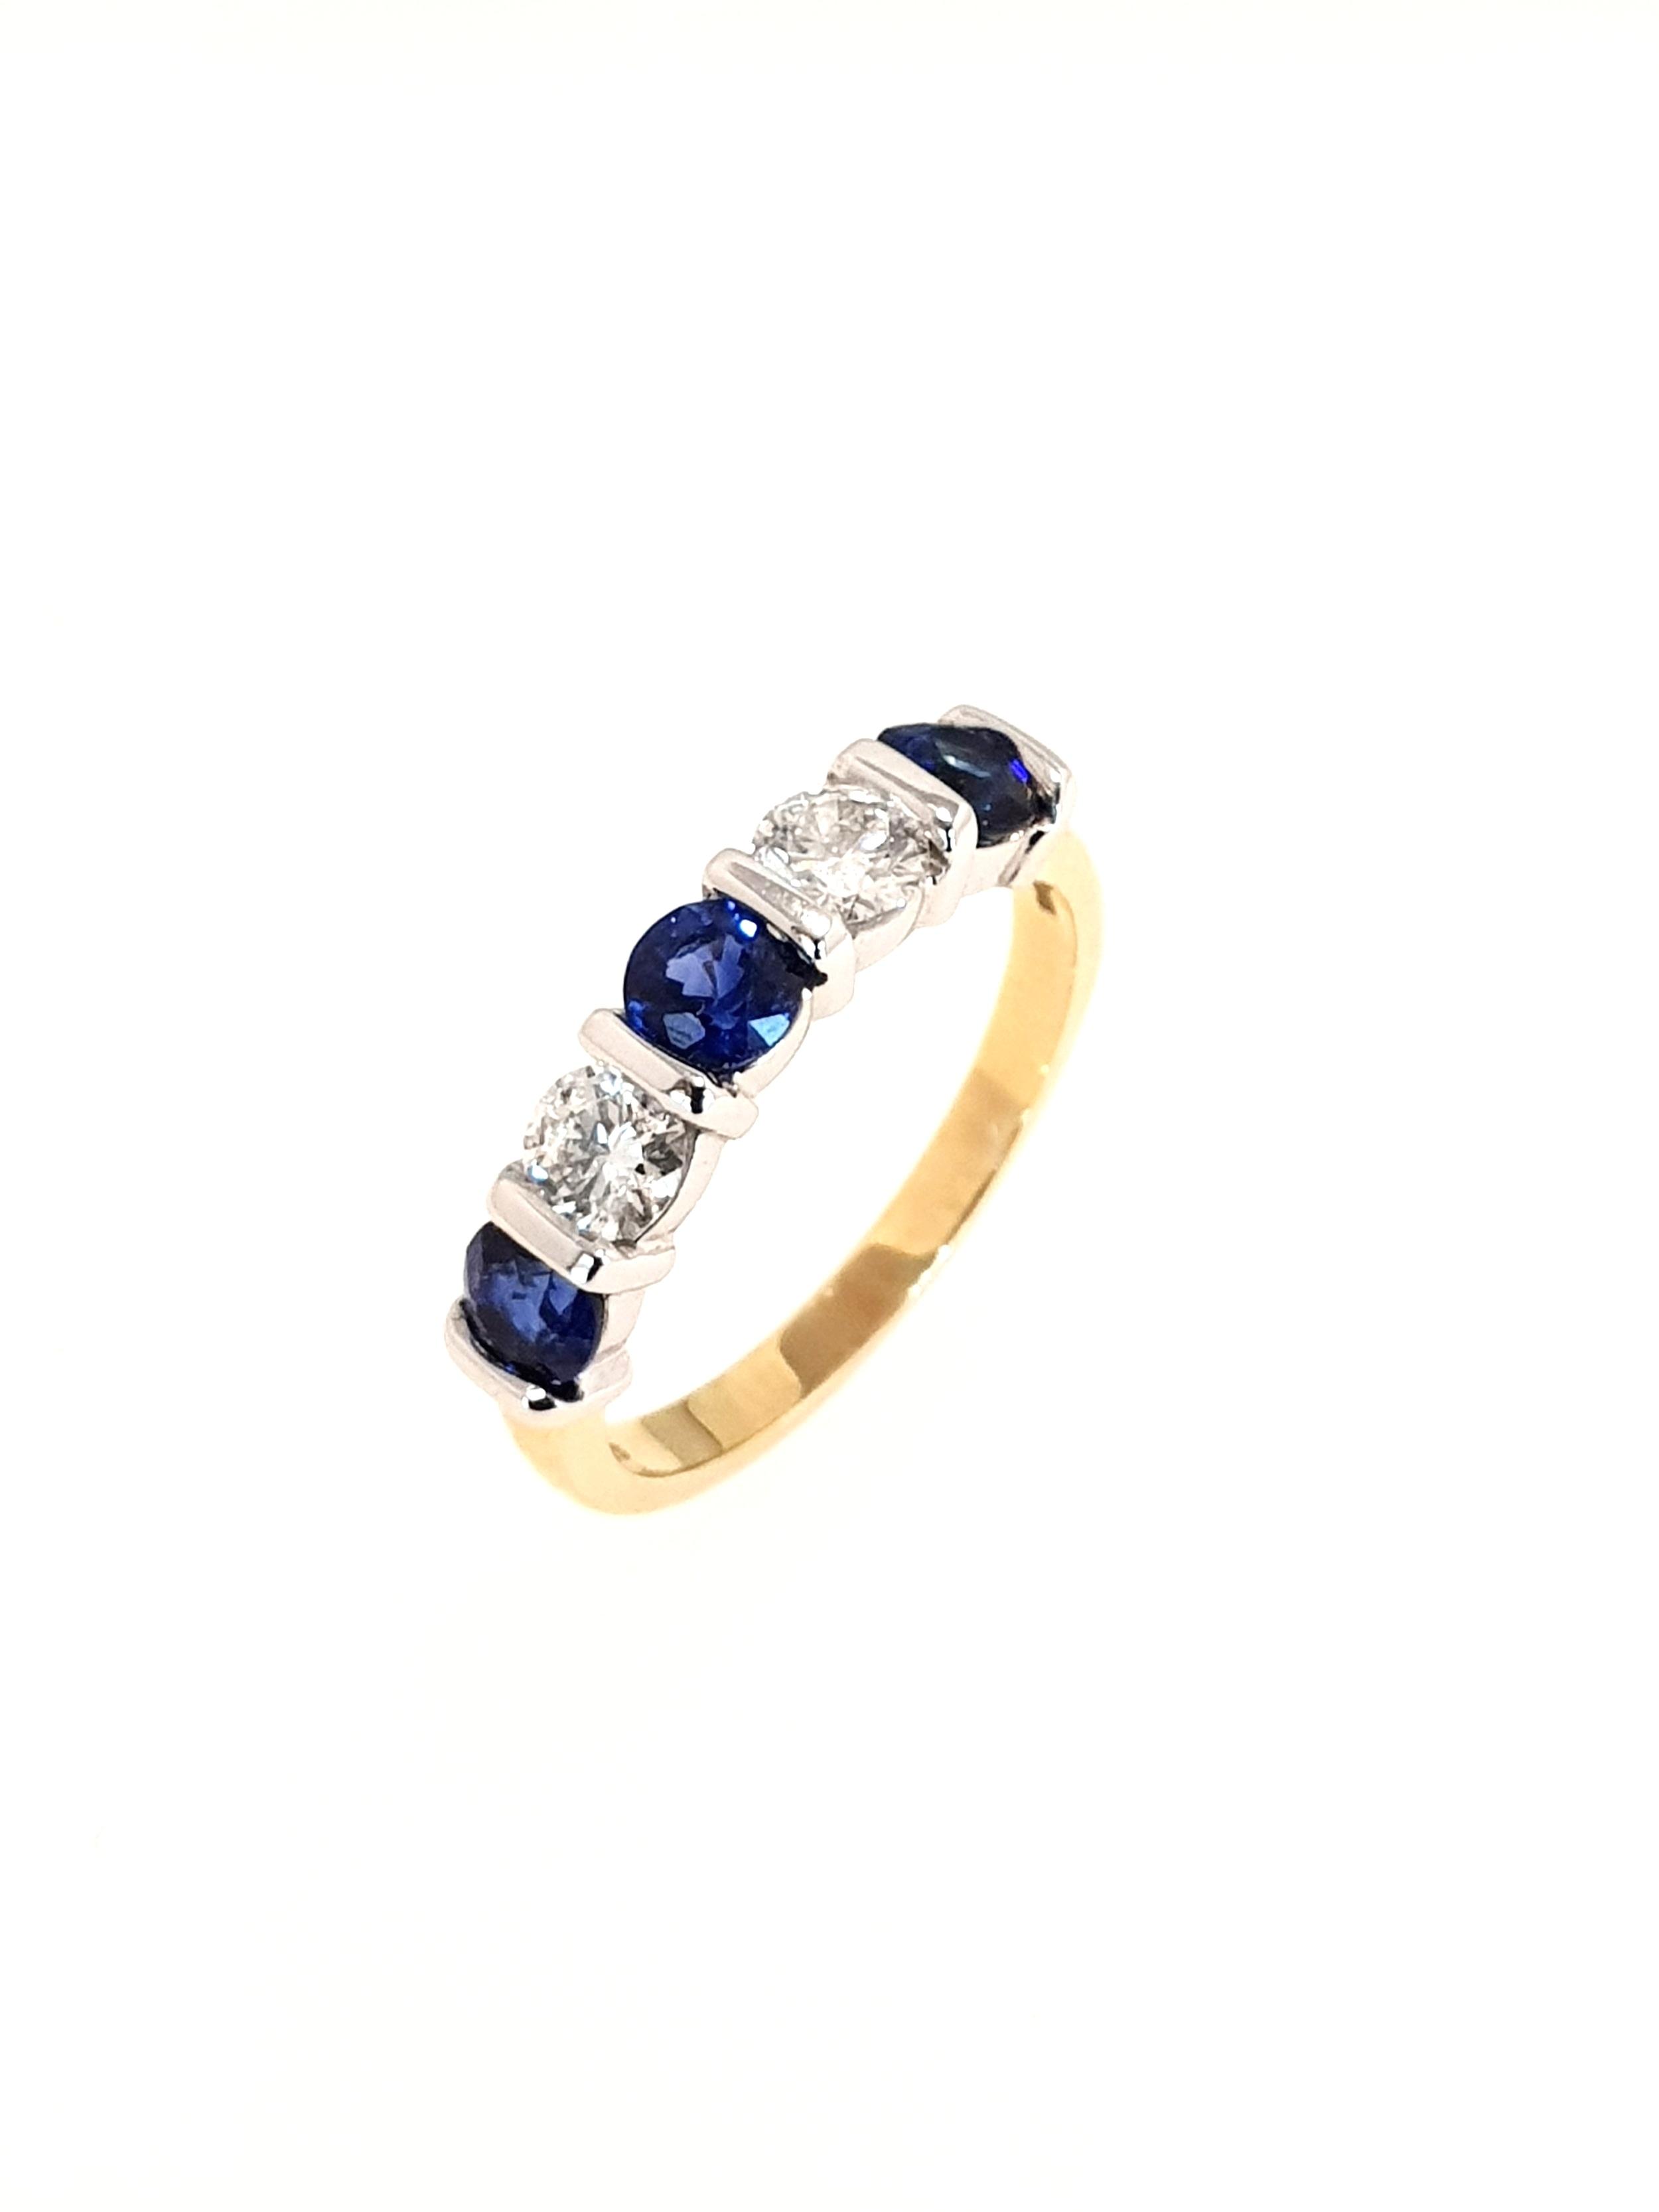 18ct Yellow Gold Sapphire & Diamond Ring  Diamond: .48ct, G, Si1  Stock Code: N8947  £3675